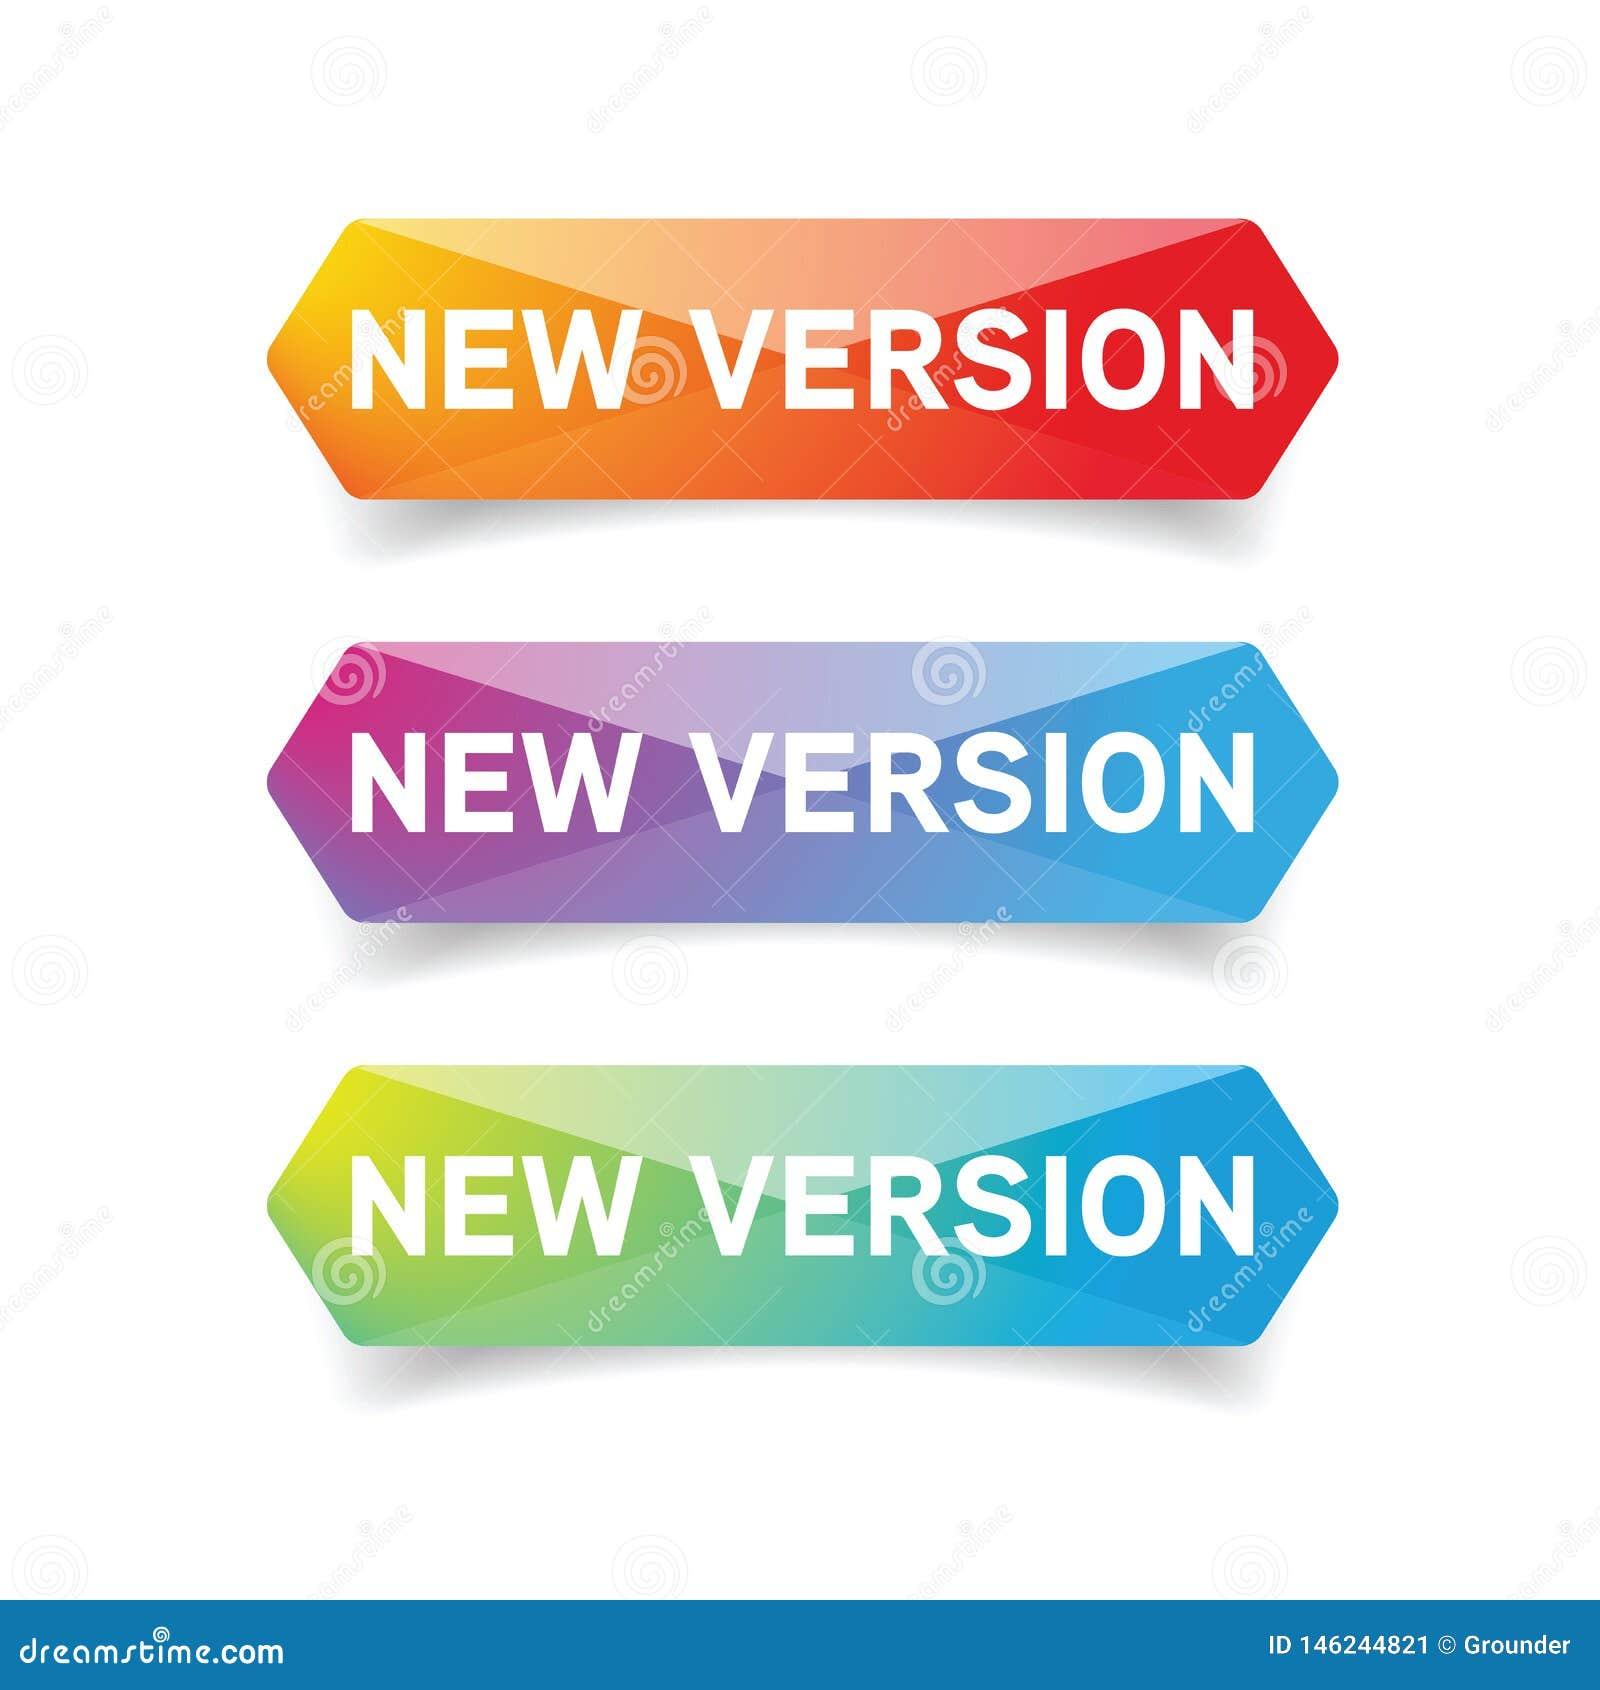 New Version button set